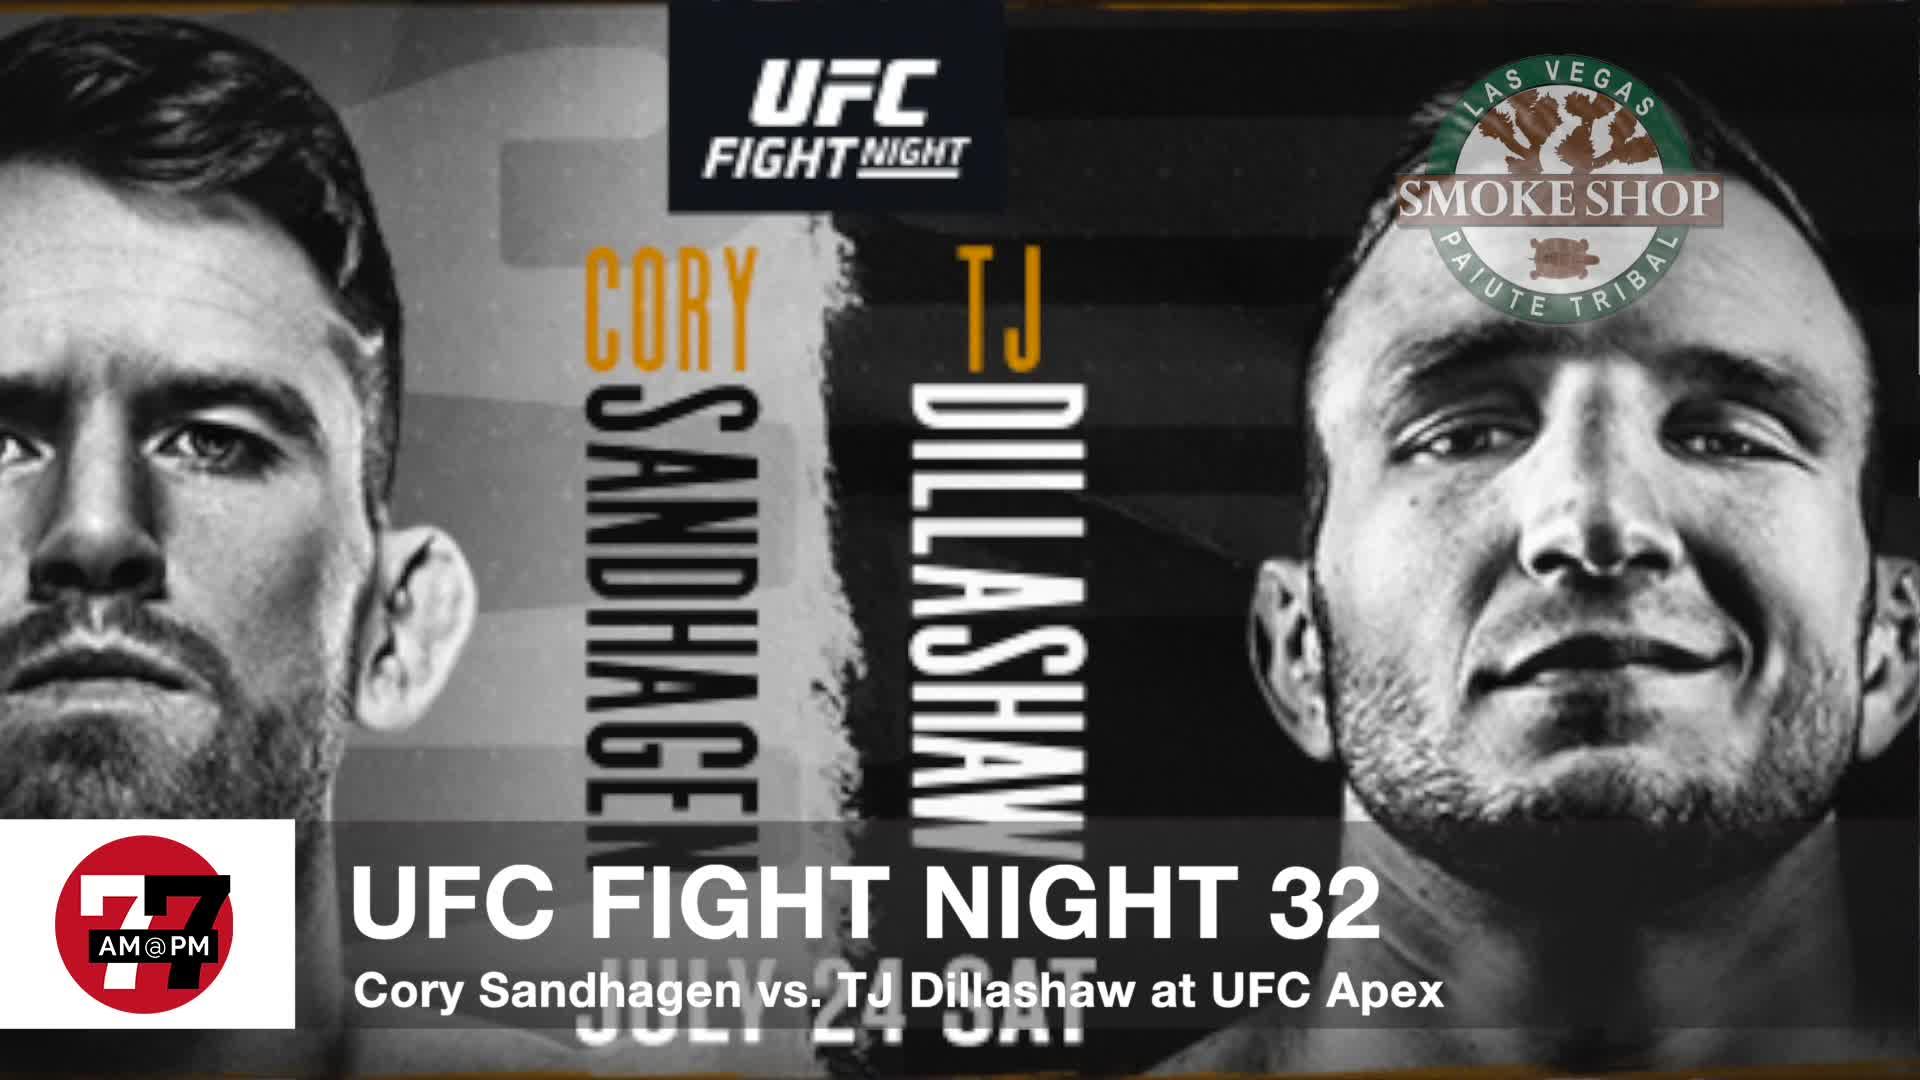 7@7PM UFC Fight Night 32 Odds